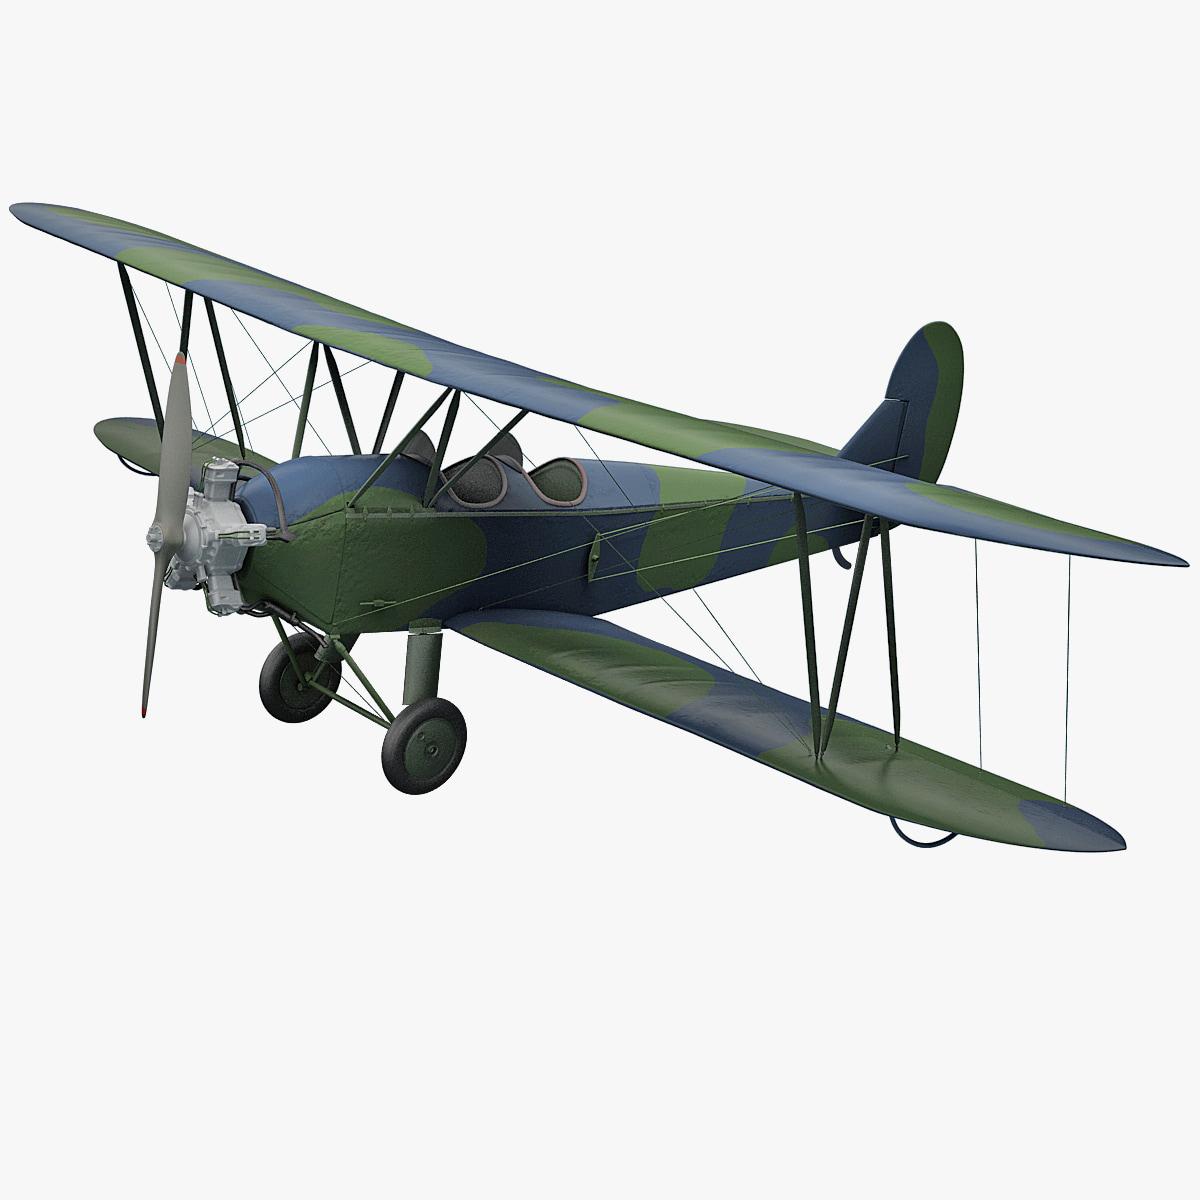 Plane_Polikarpov_Po-2_000.jpg